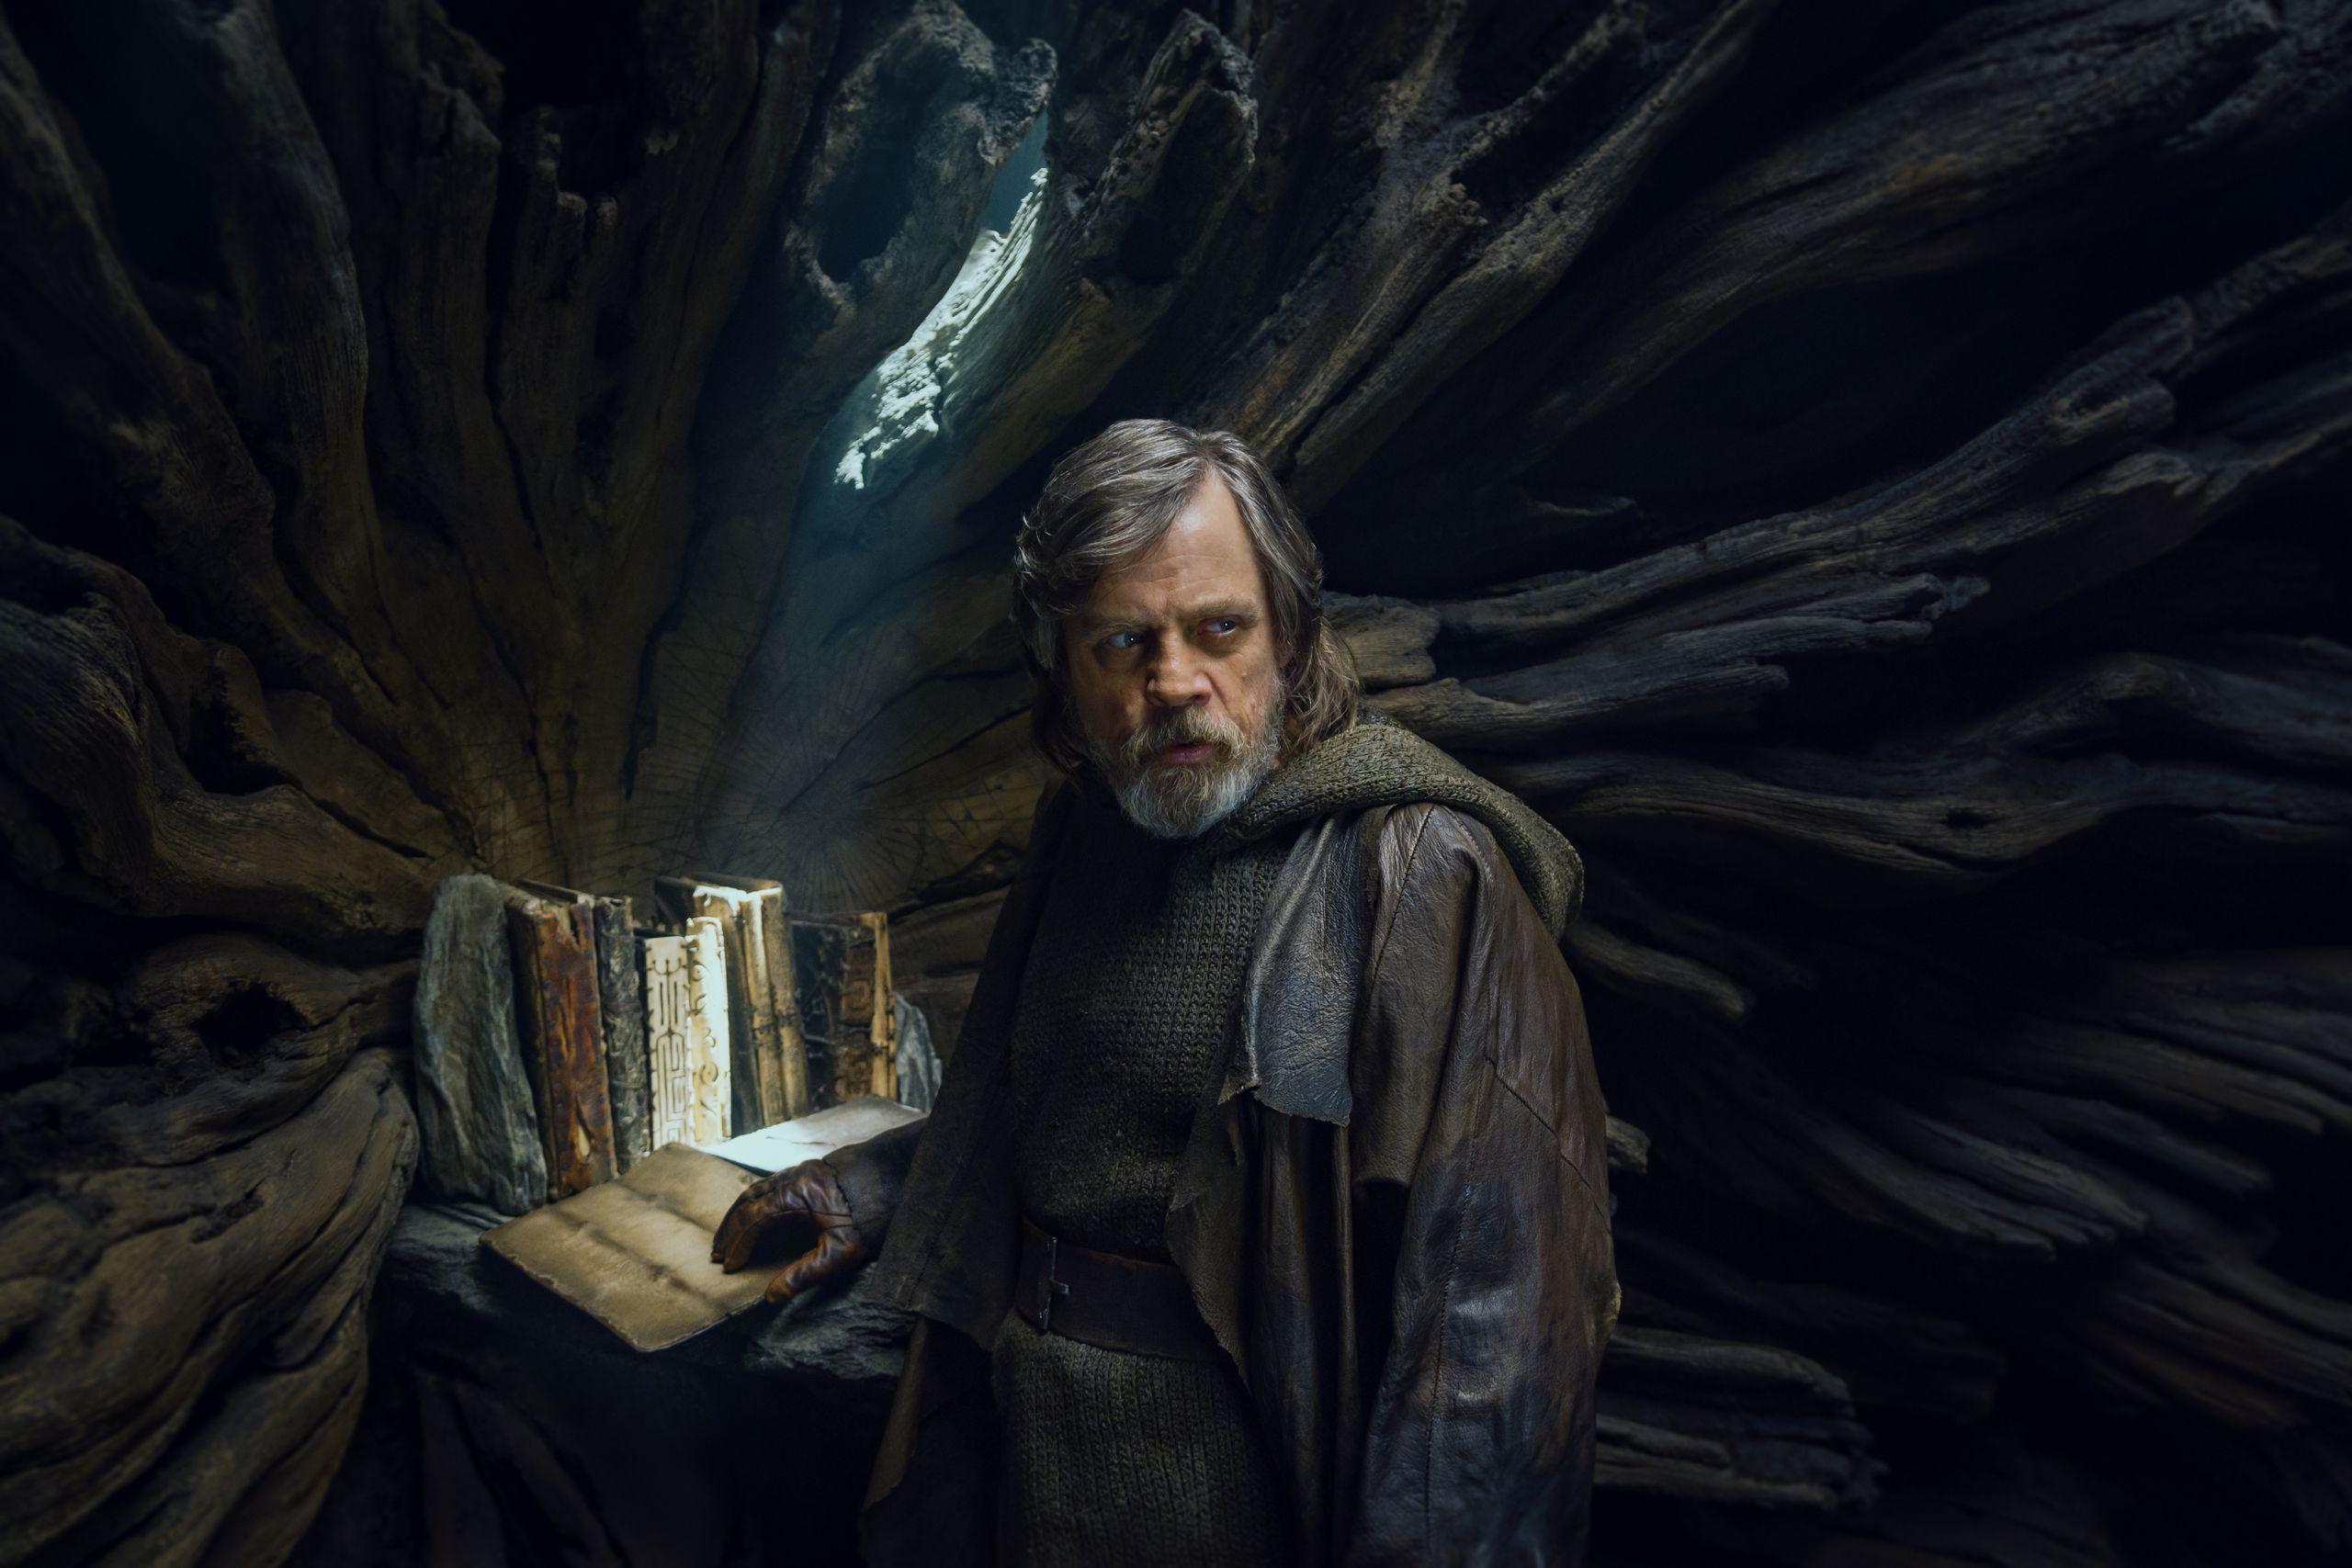 Star Wars : Les Derniers Jedi, Awake